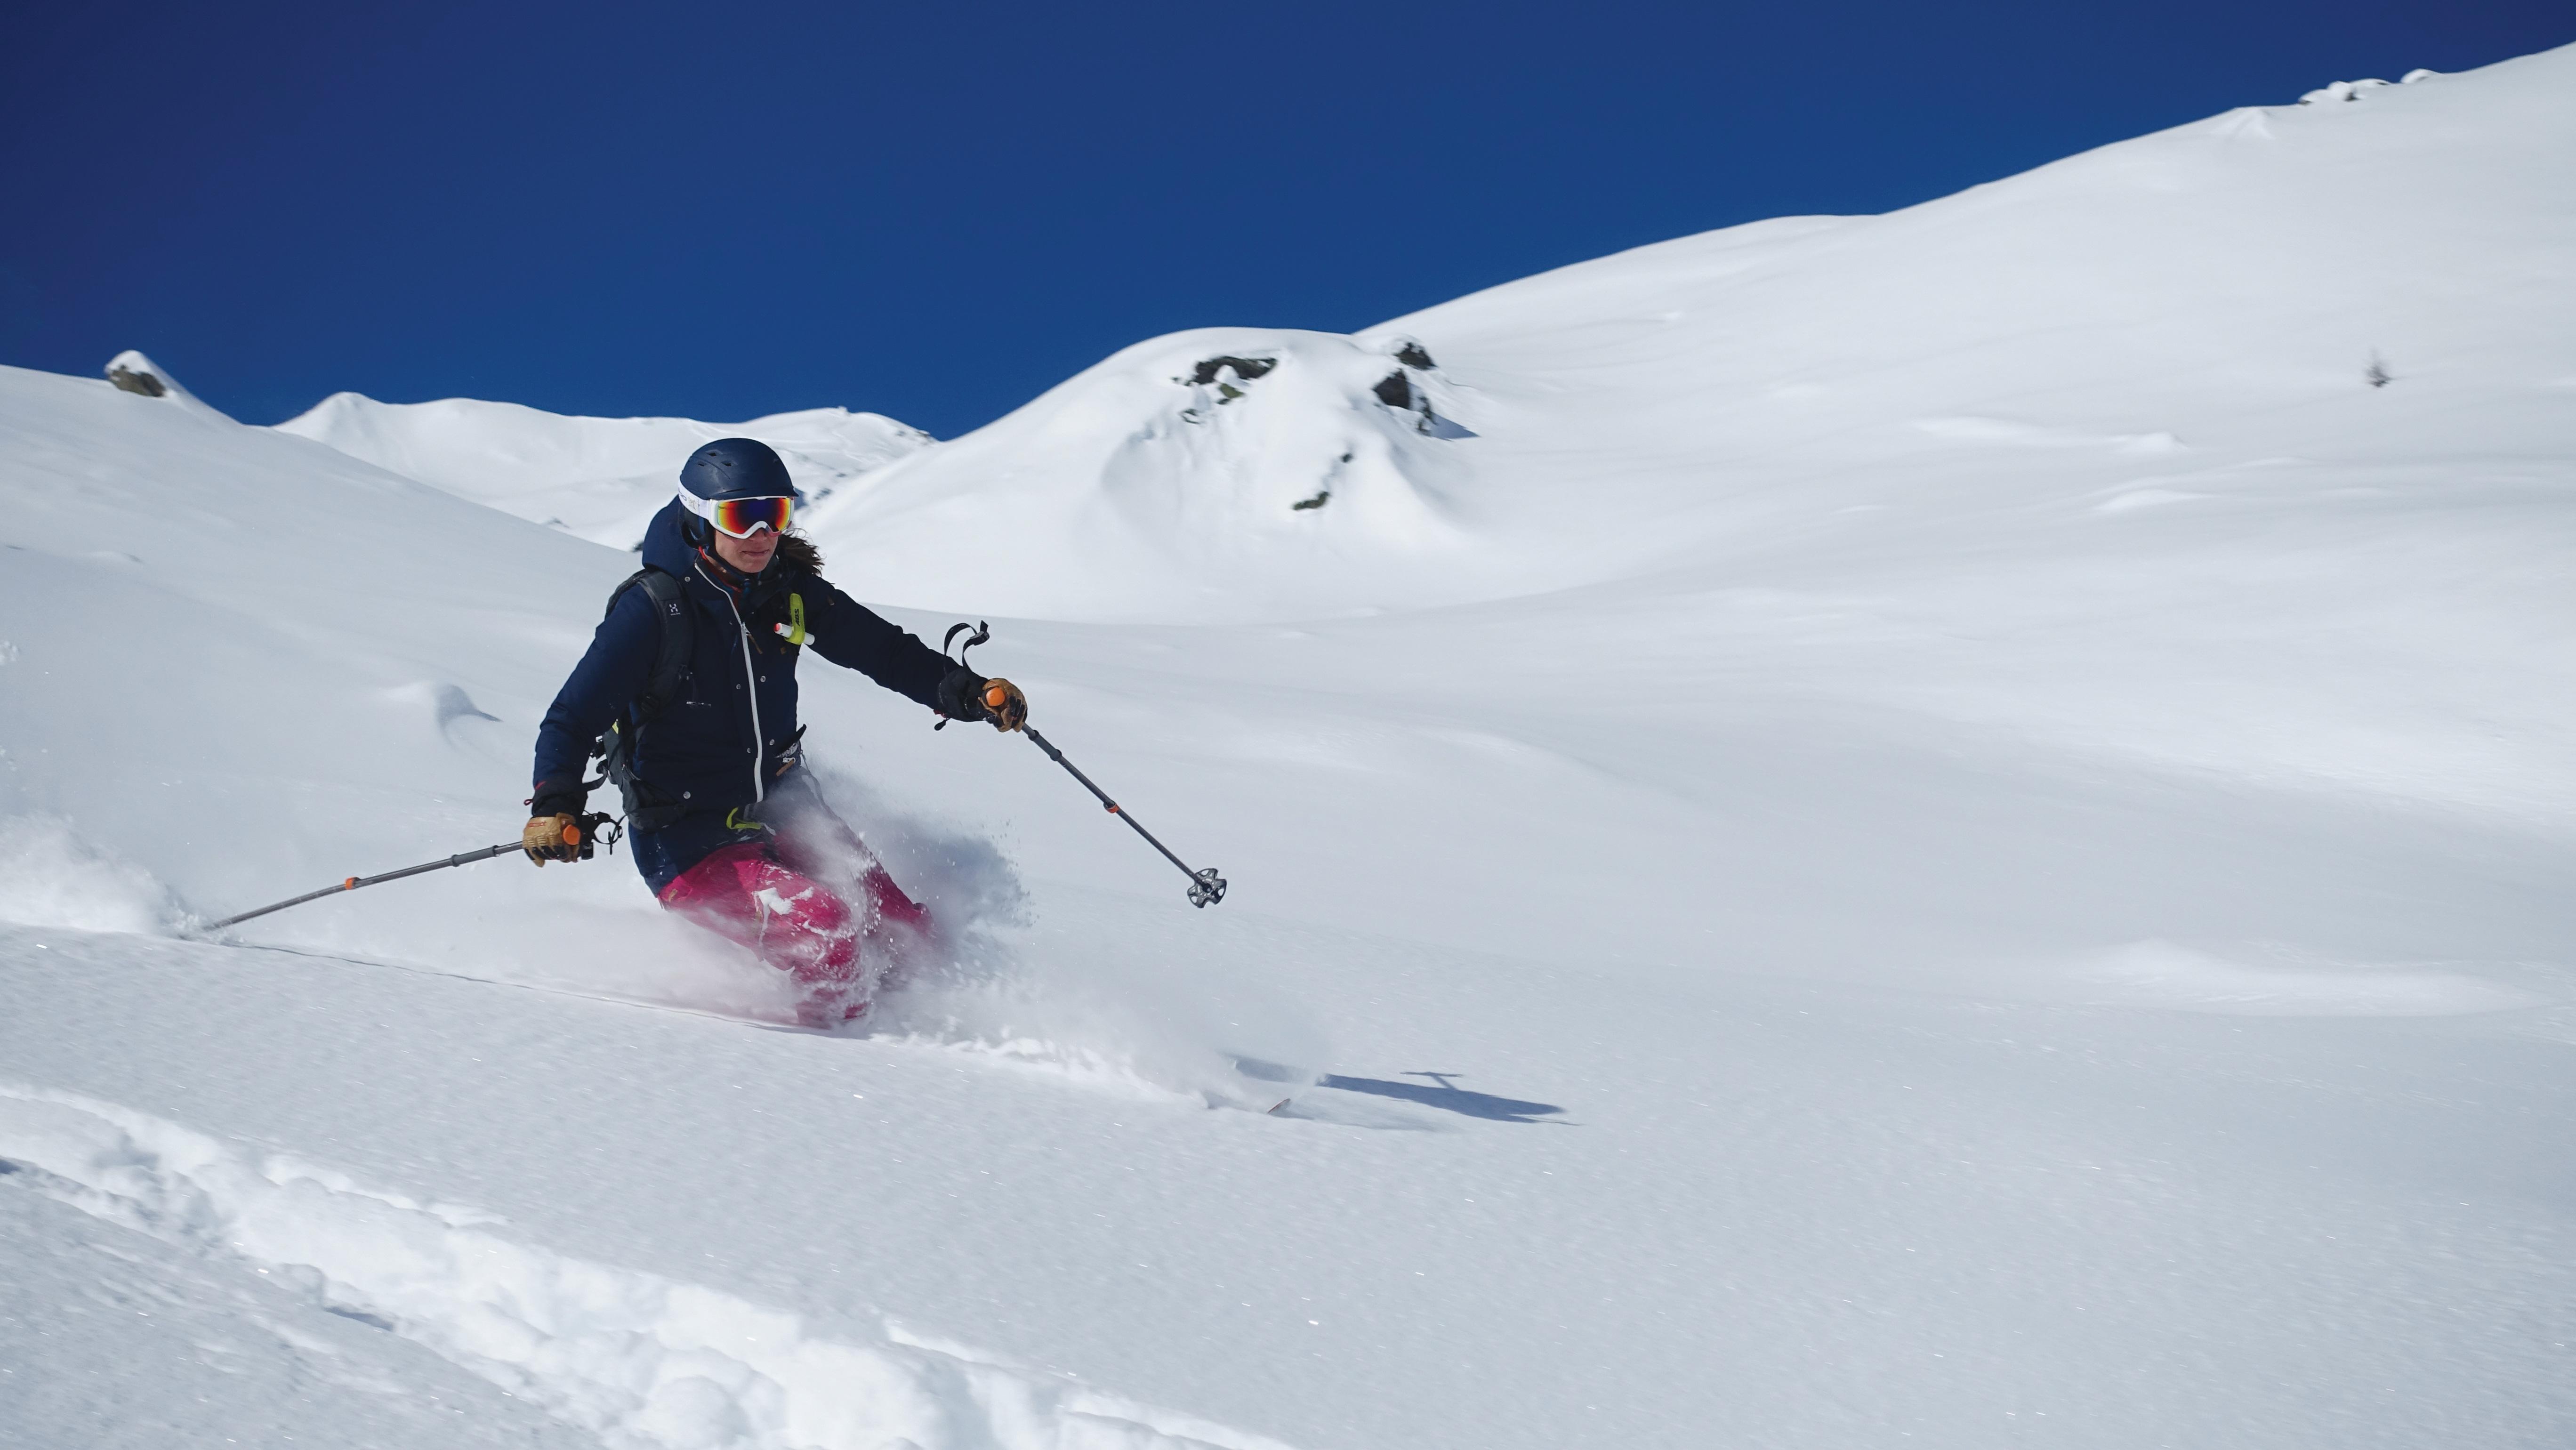 Freeride, Tiefschnee, Gemsstock, Andermatt, Skifahrerin, Uri